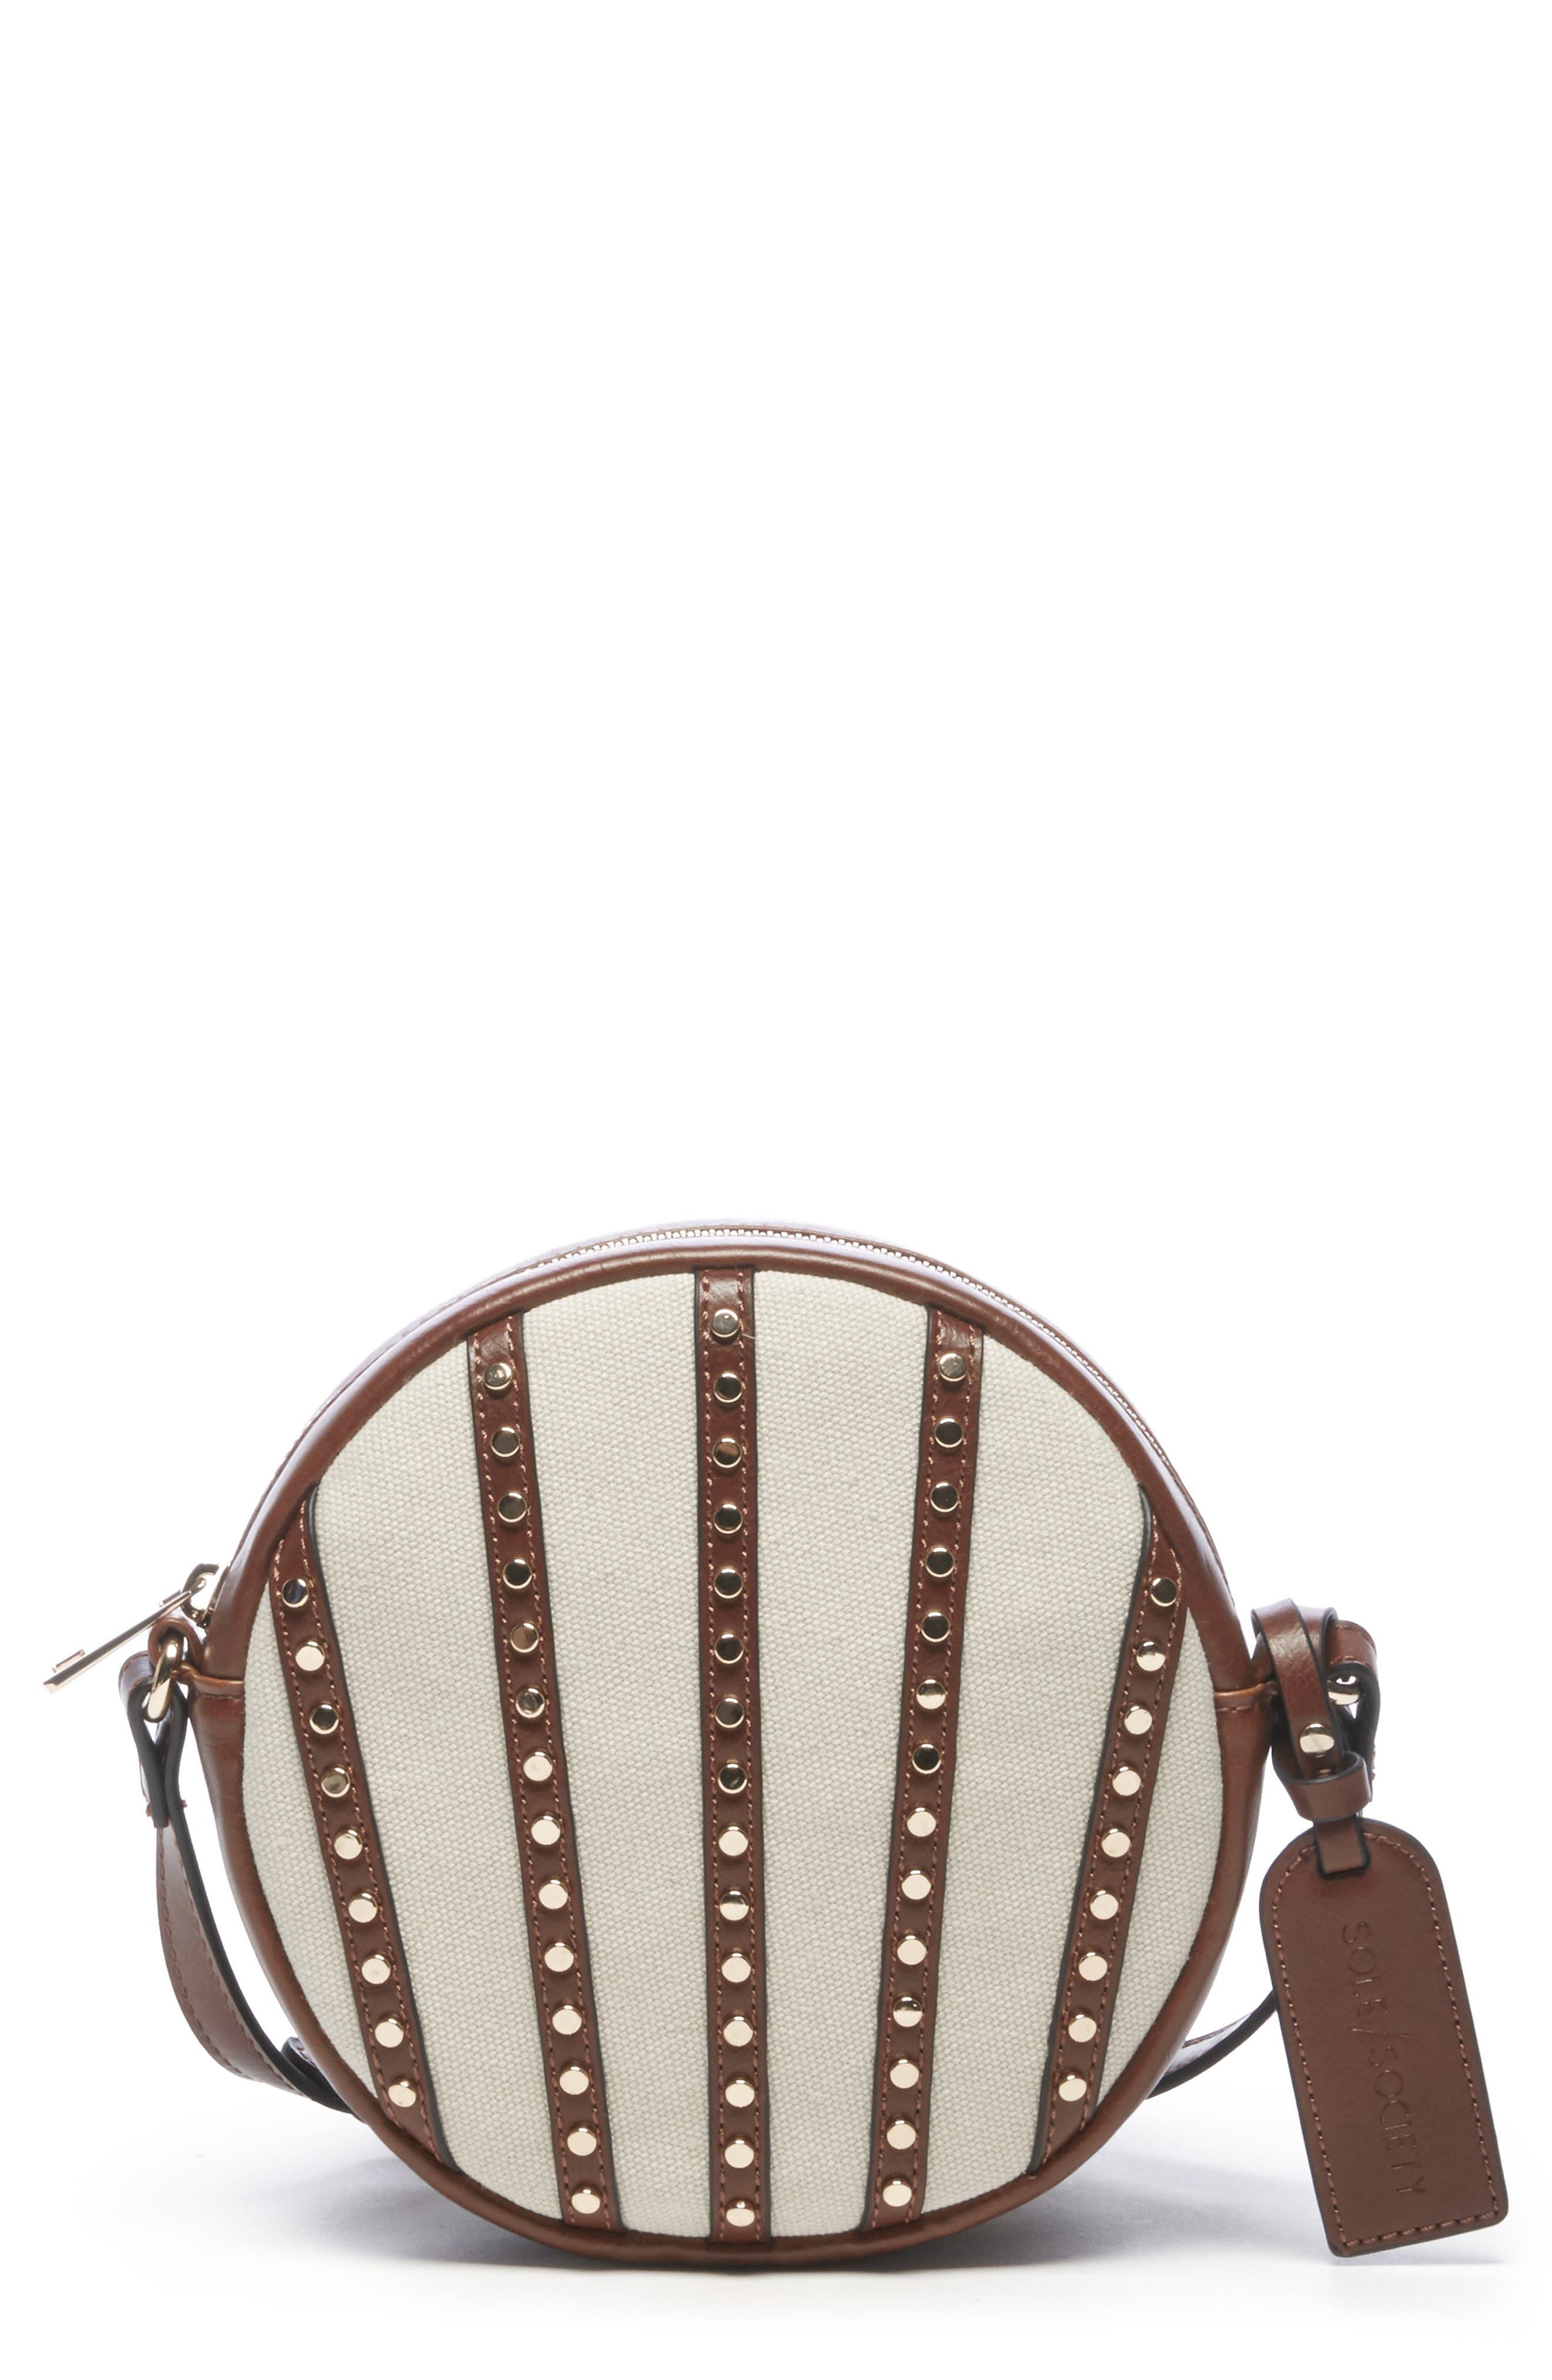 Aira Studded Crossbody Bag,                         Main,                         color, NATURAL